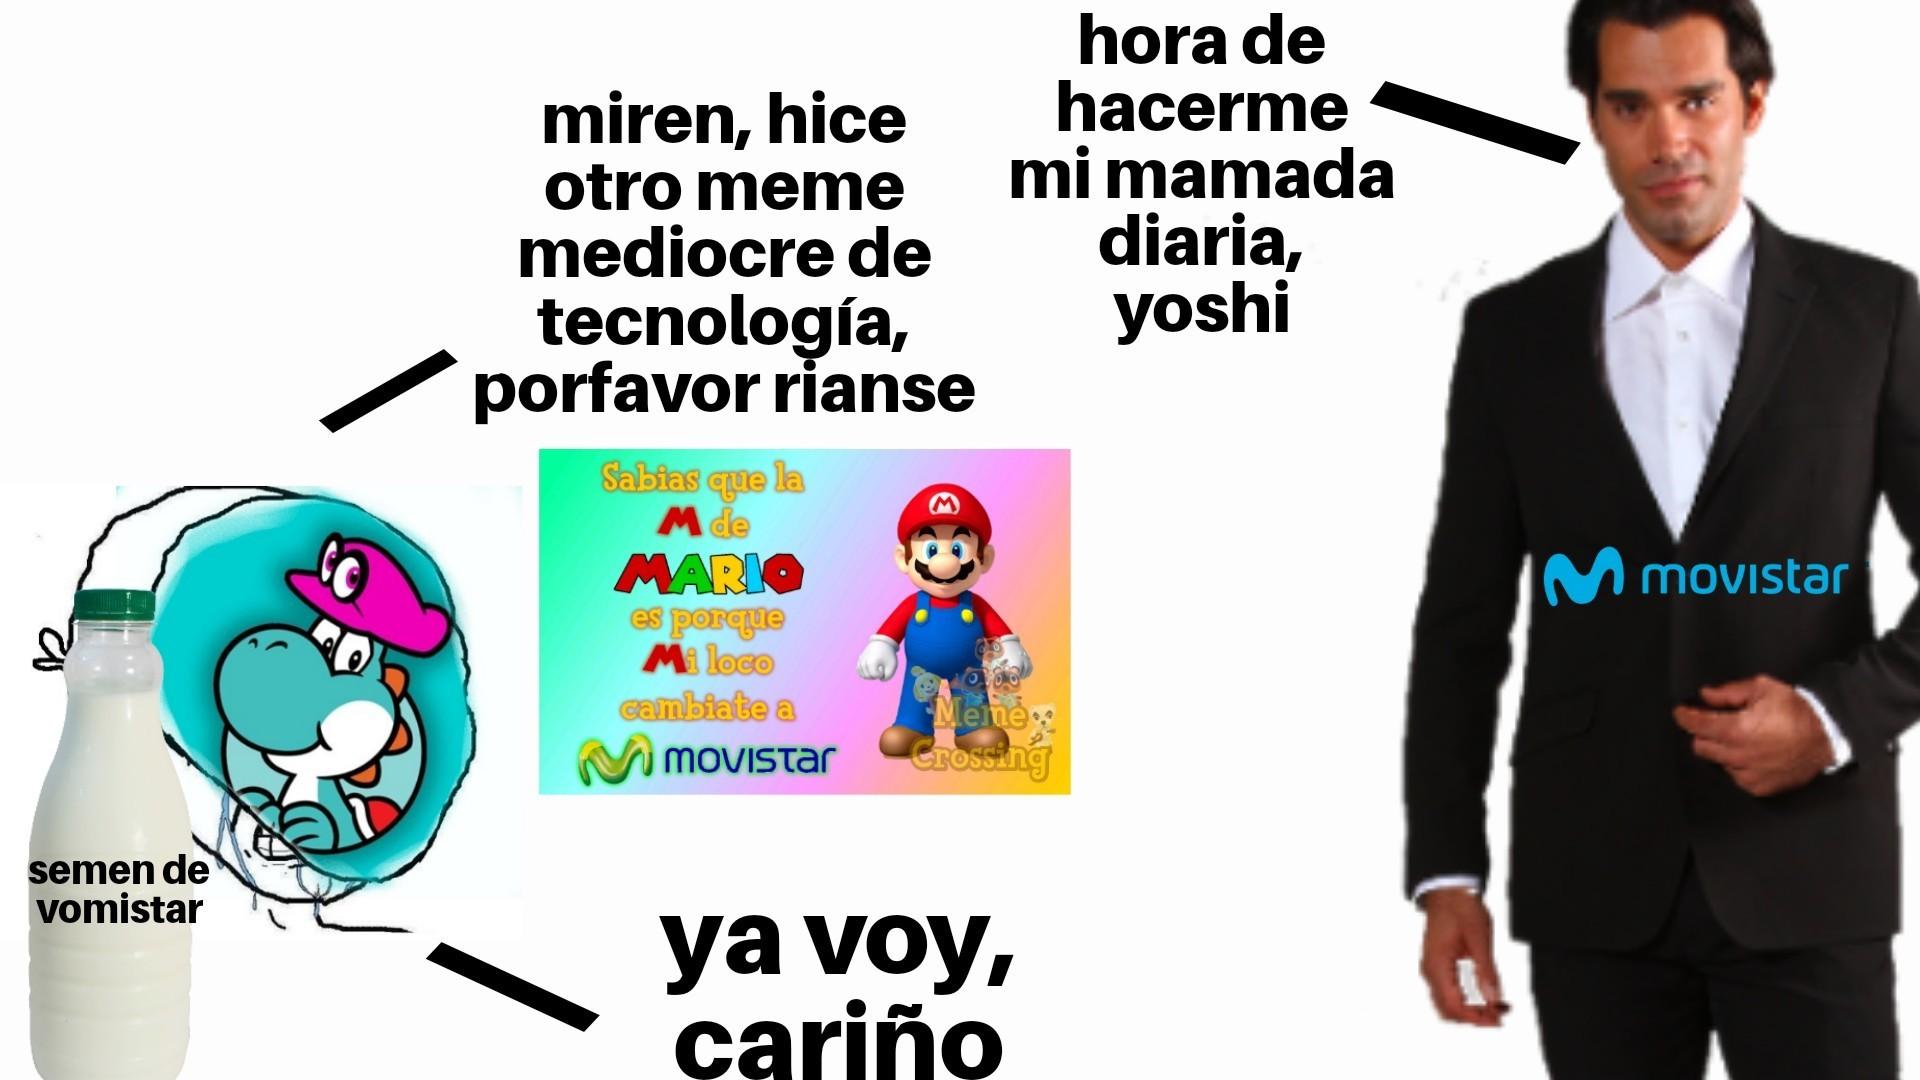 Reputo el yoshi - meme